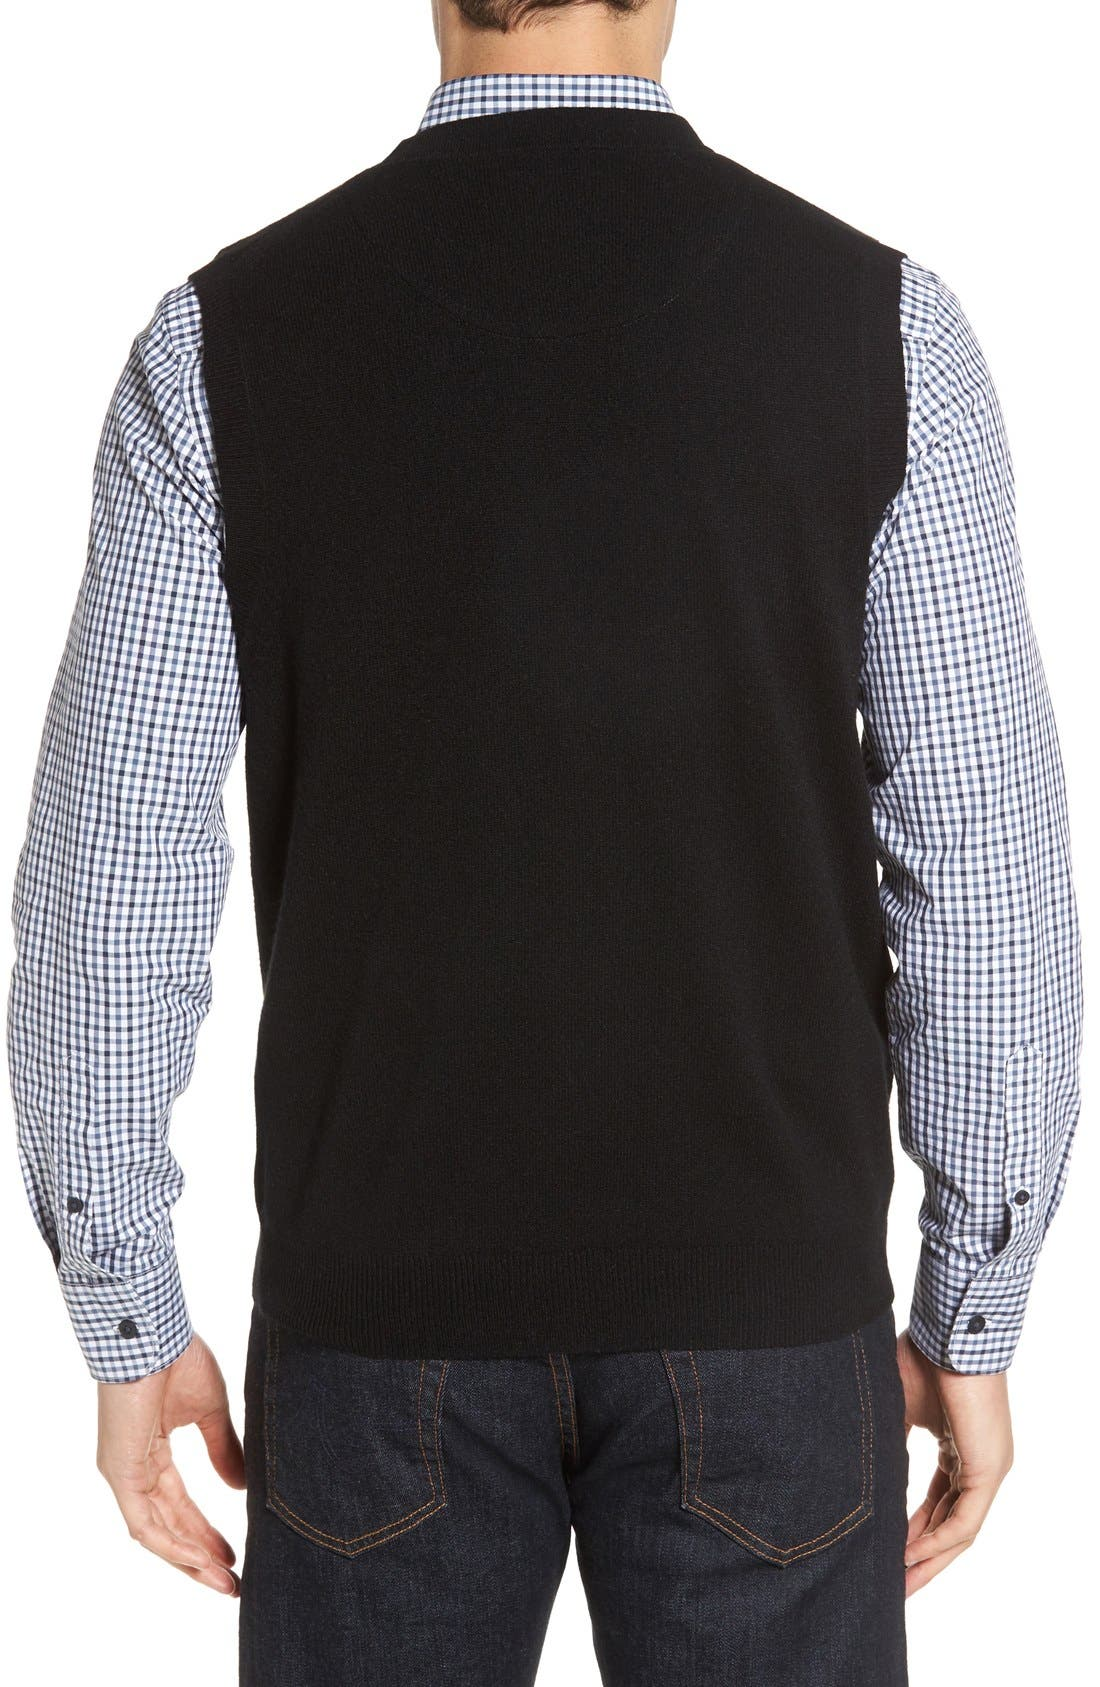 Cashmere V-Neck Sweater Vest,                             Alternate thumbnail 7, color,                             BLACK CAVIAR